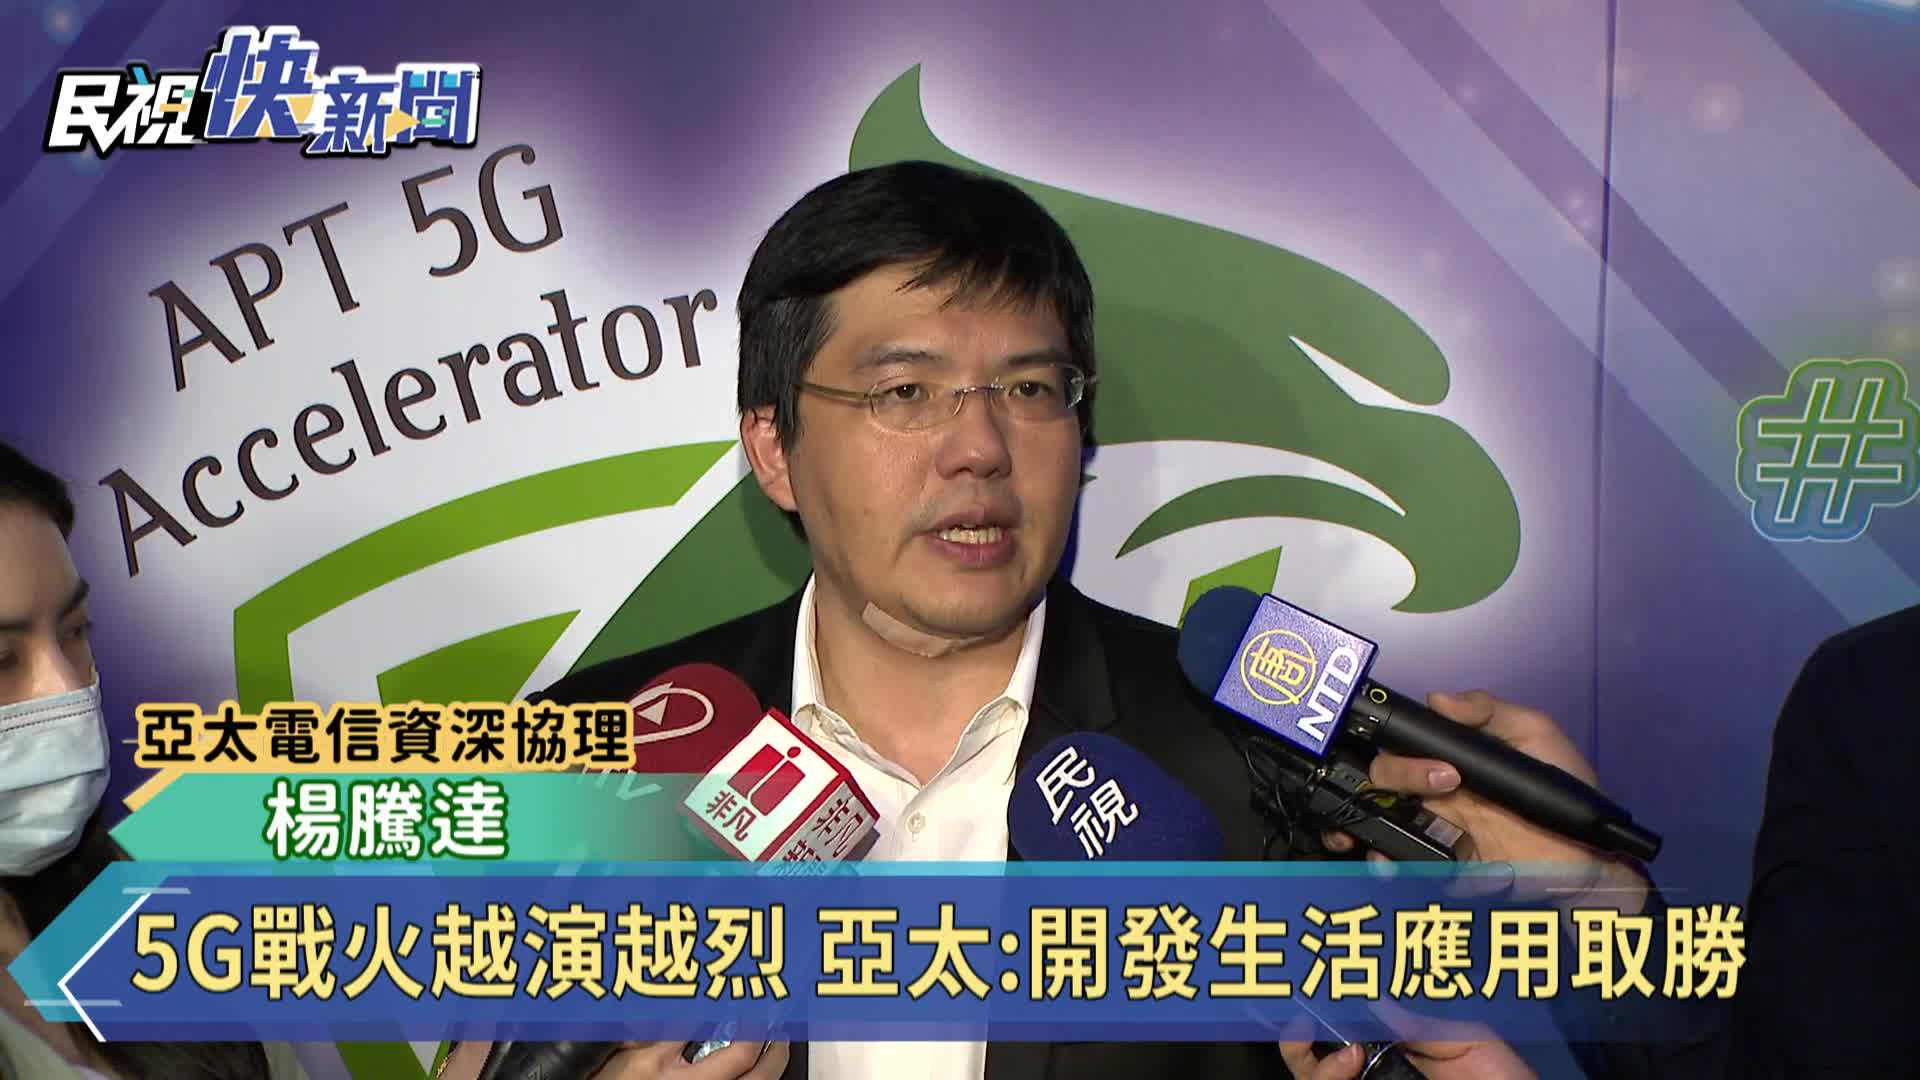 5G戰火越演越烈 亞太:開發生活應用取勝